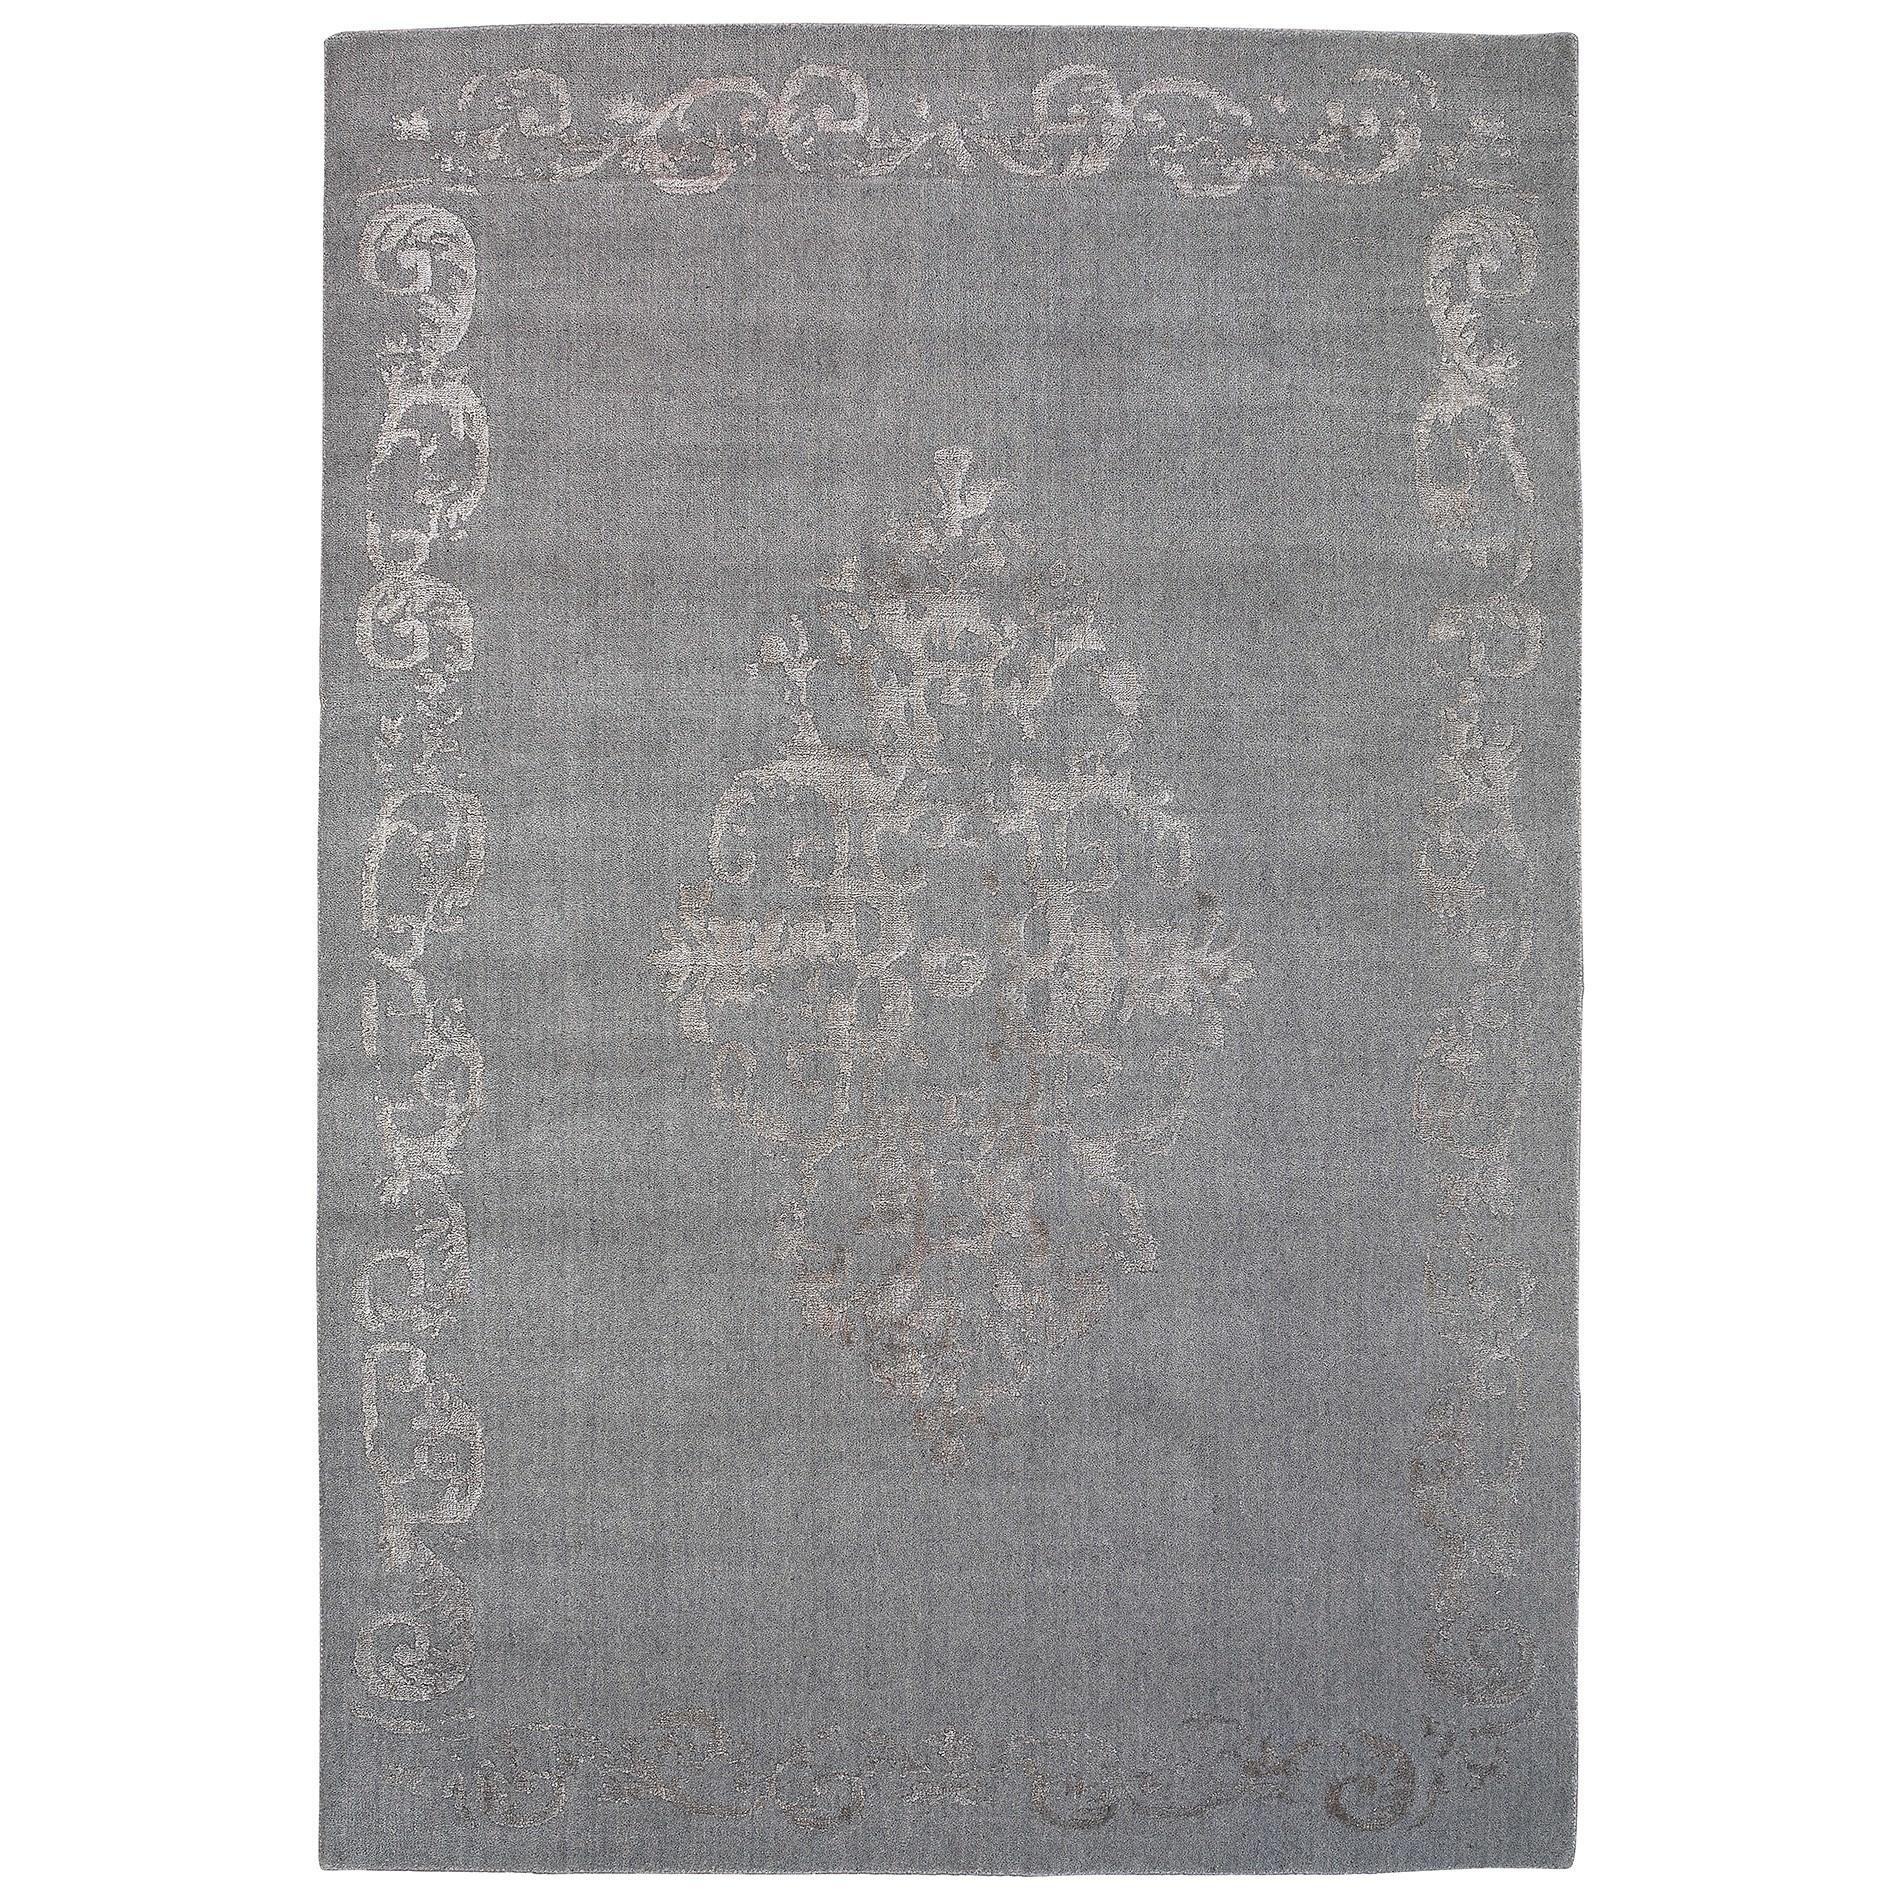 Vienna No.048 Handmade Wool Transitional Rug, 380x280cm, Grey